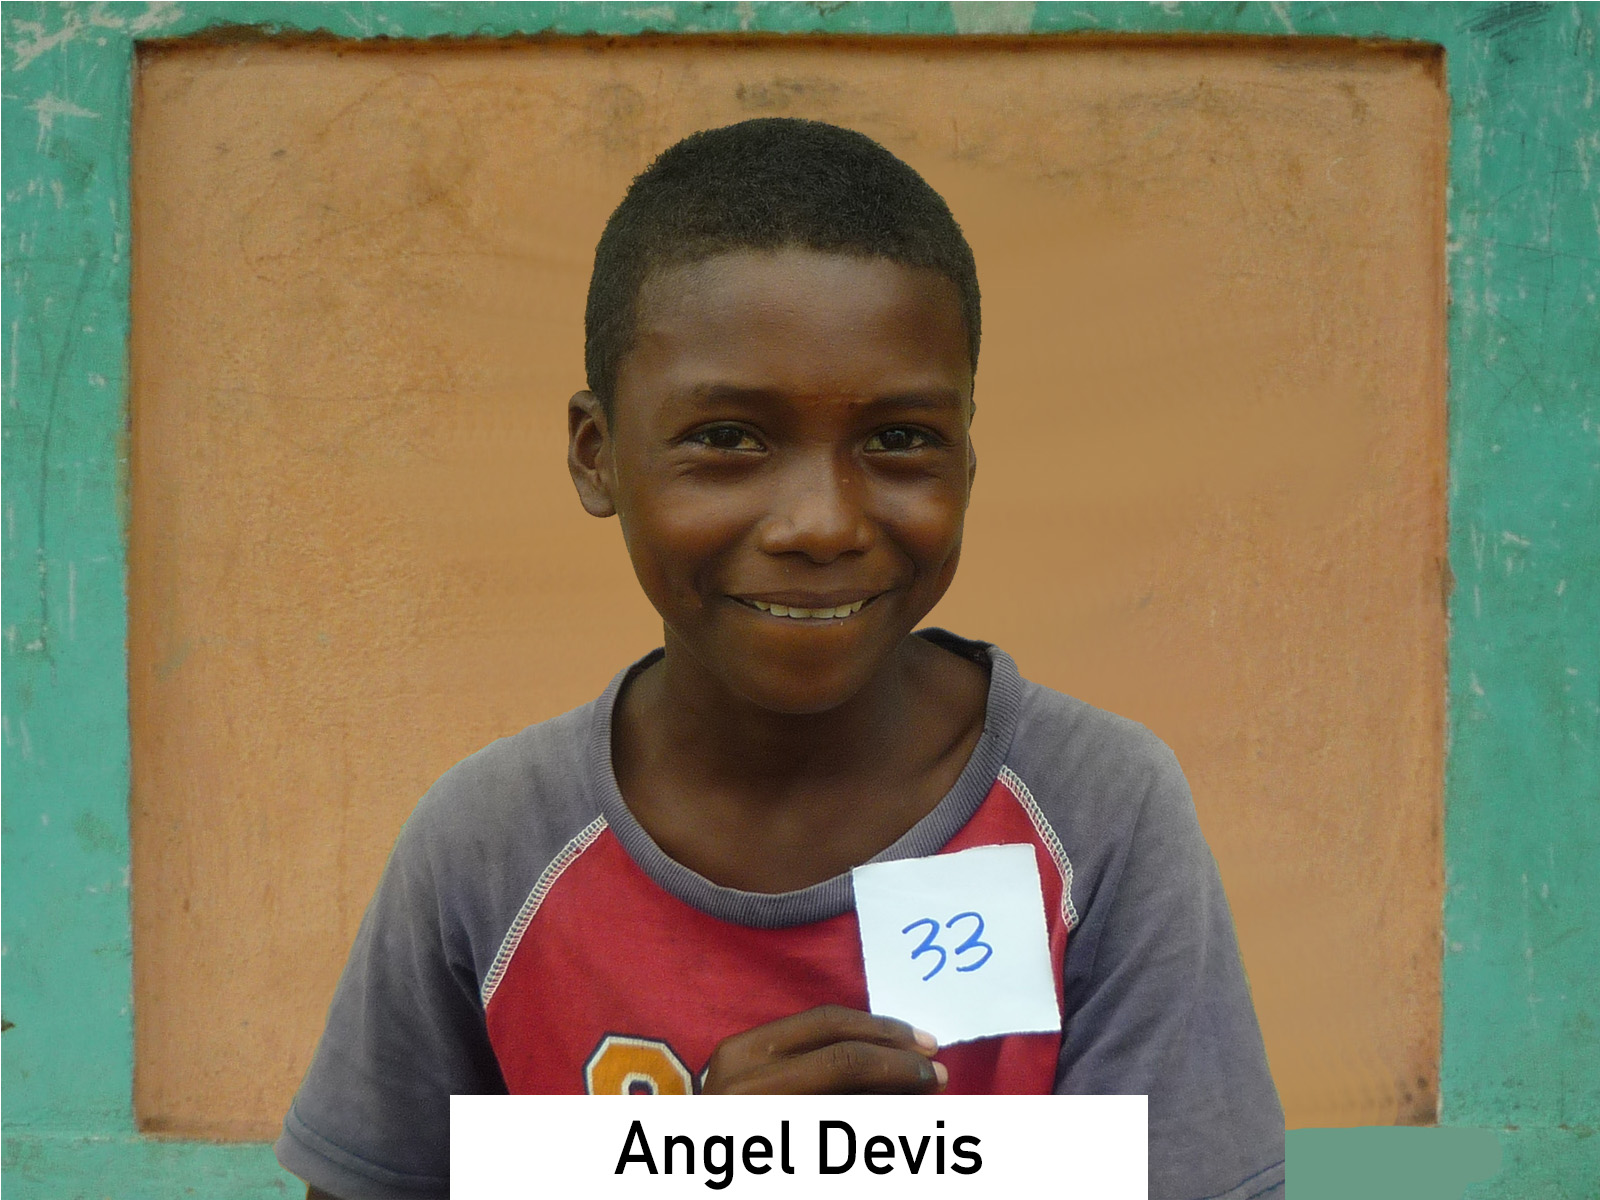 033 - Angel Devis.jpg